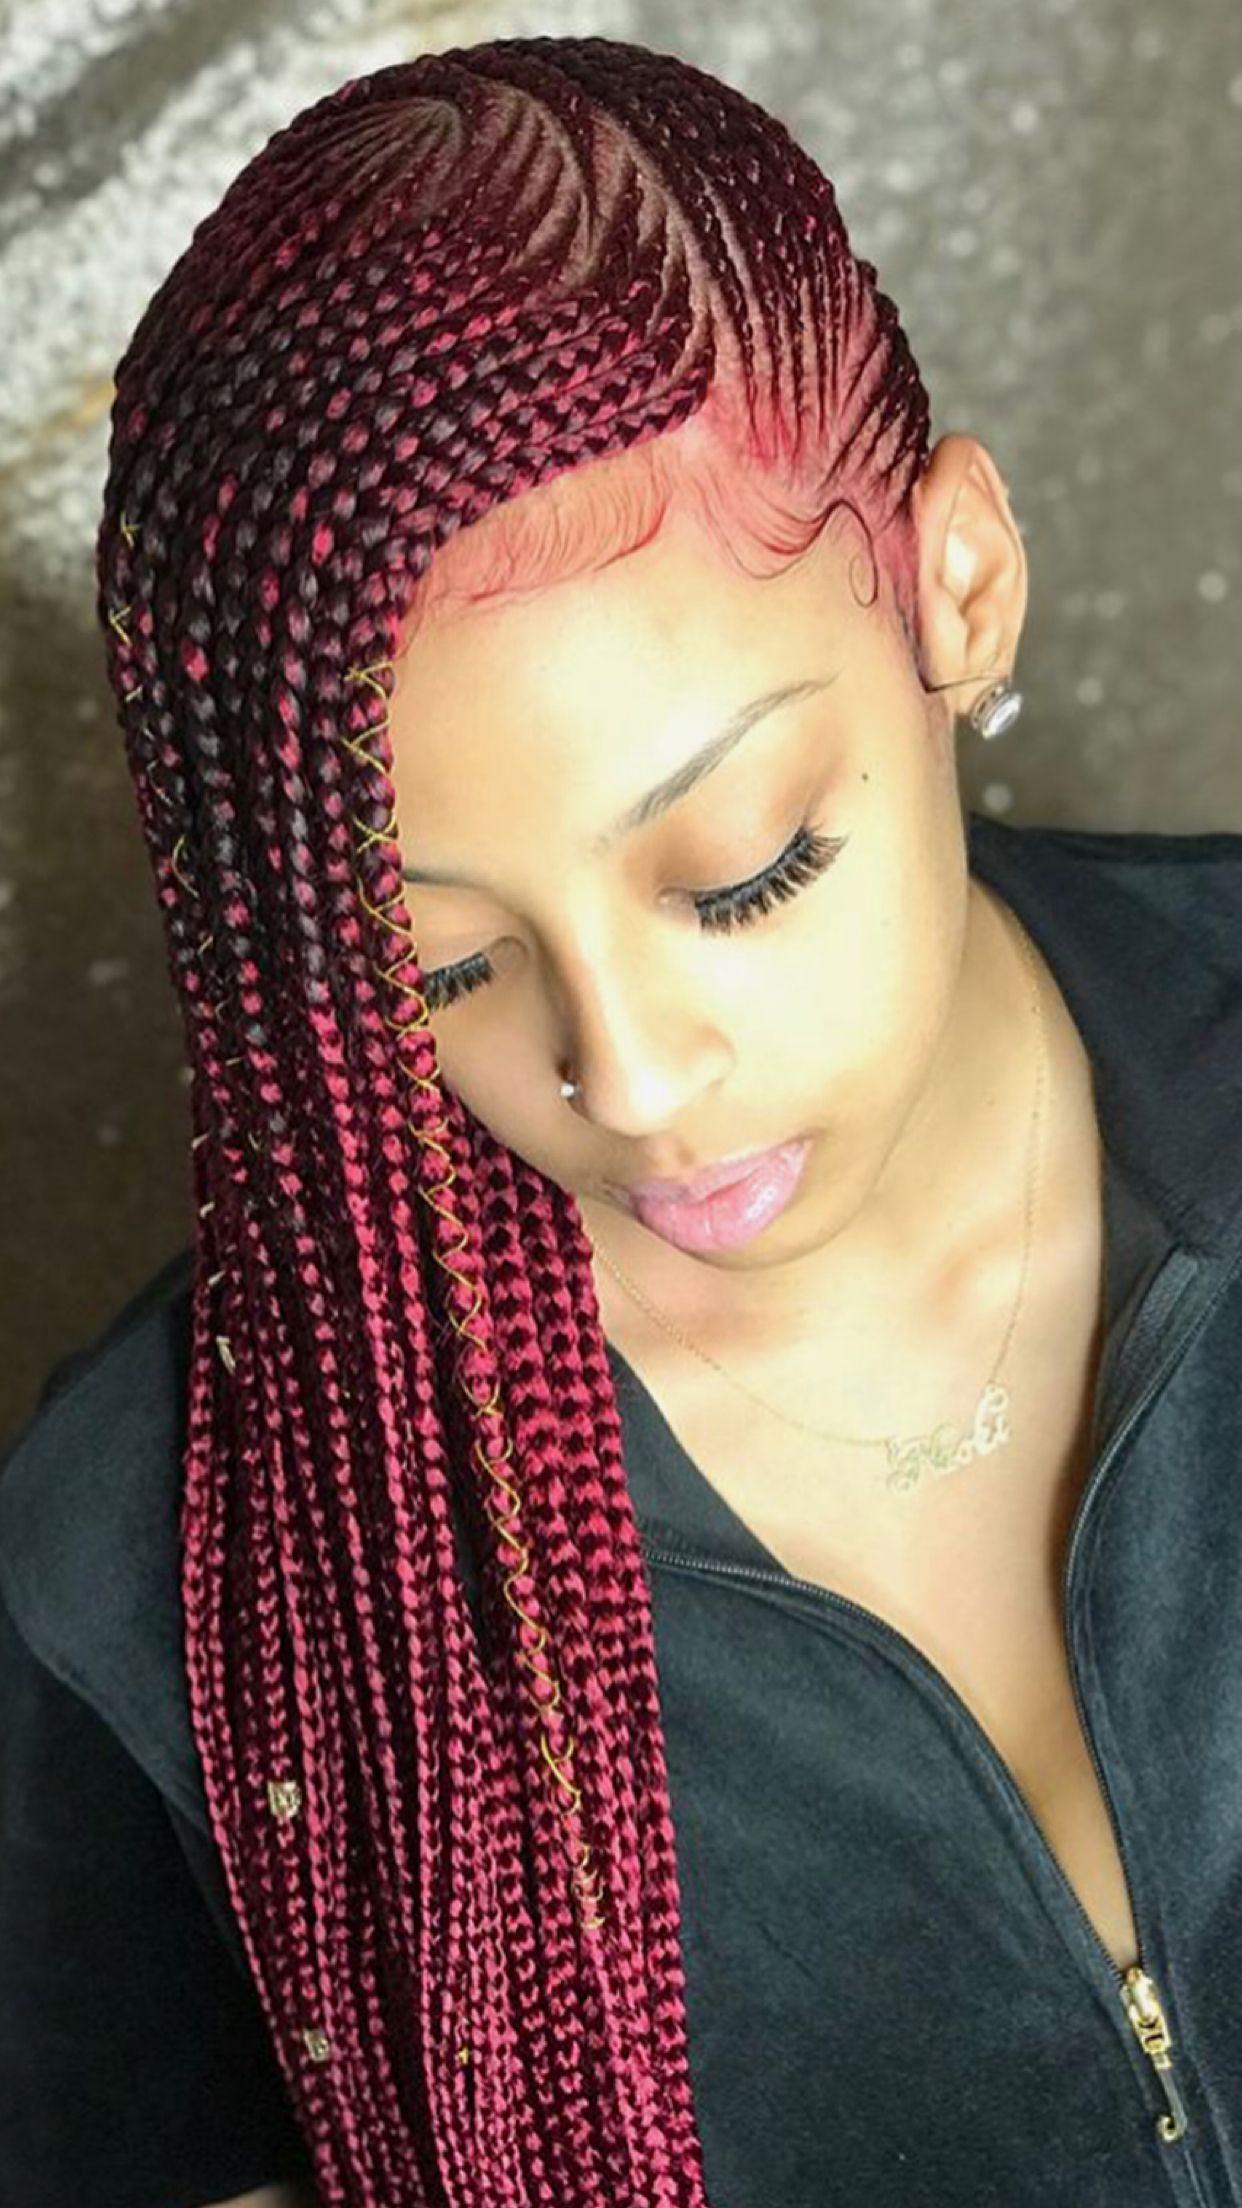 Follow Tryyveaytyѕ For More Rorrin Pins Lemonade Braids Hairstyles Braided Hairstyles Braid Styles